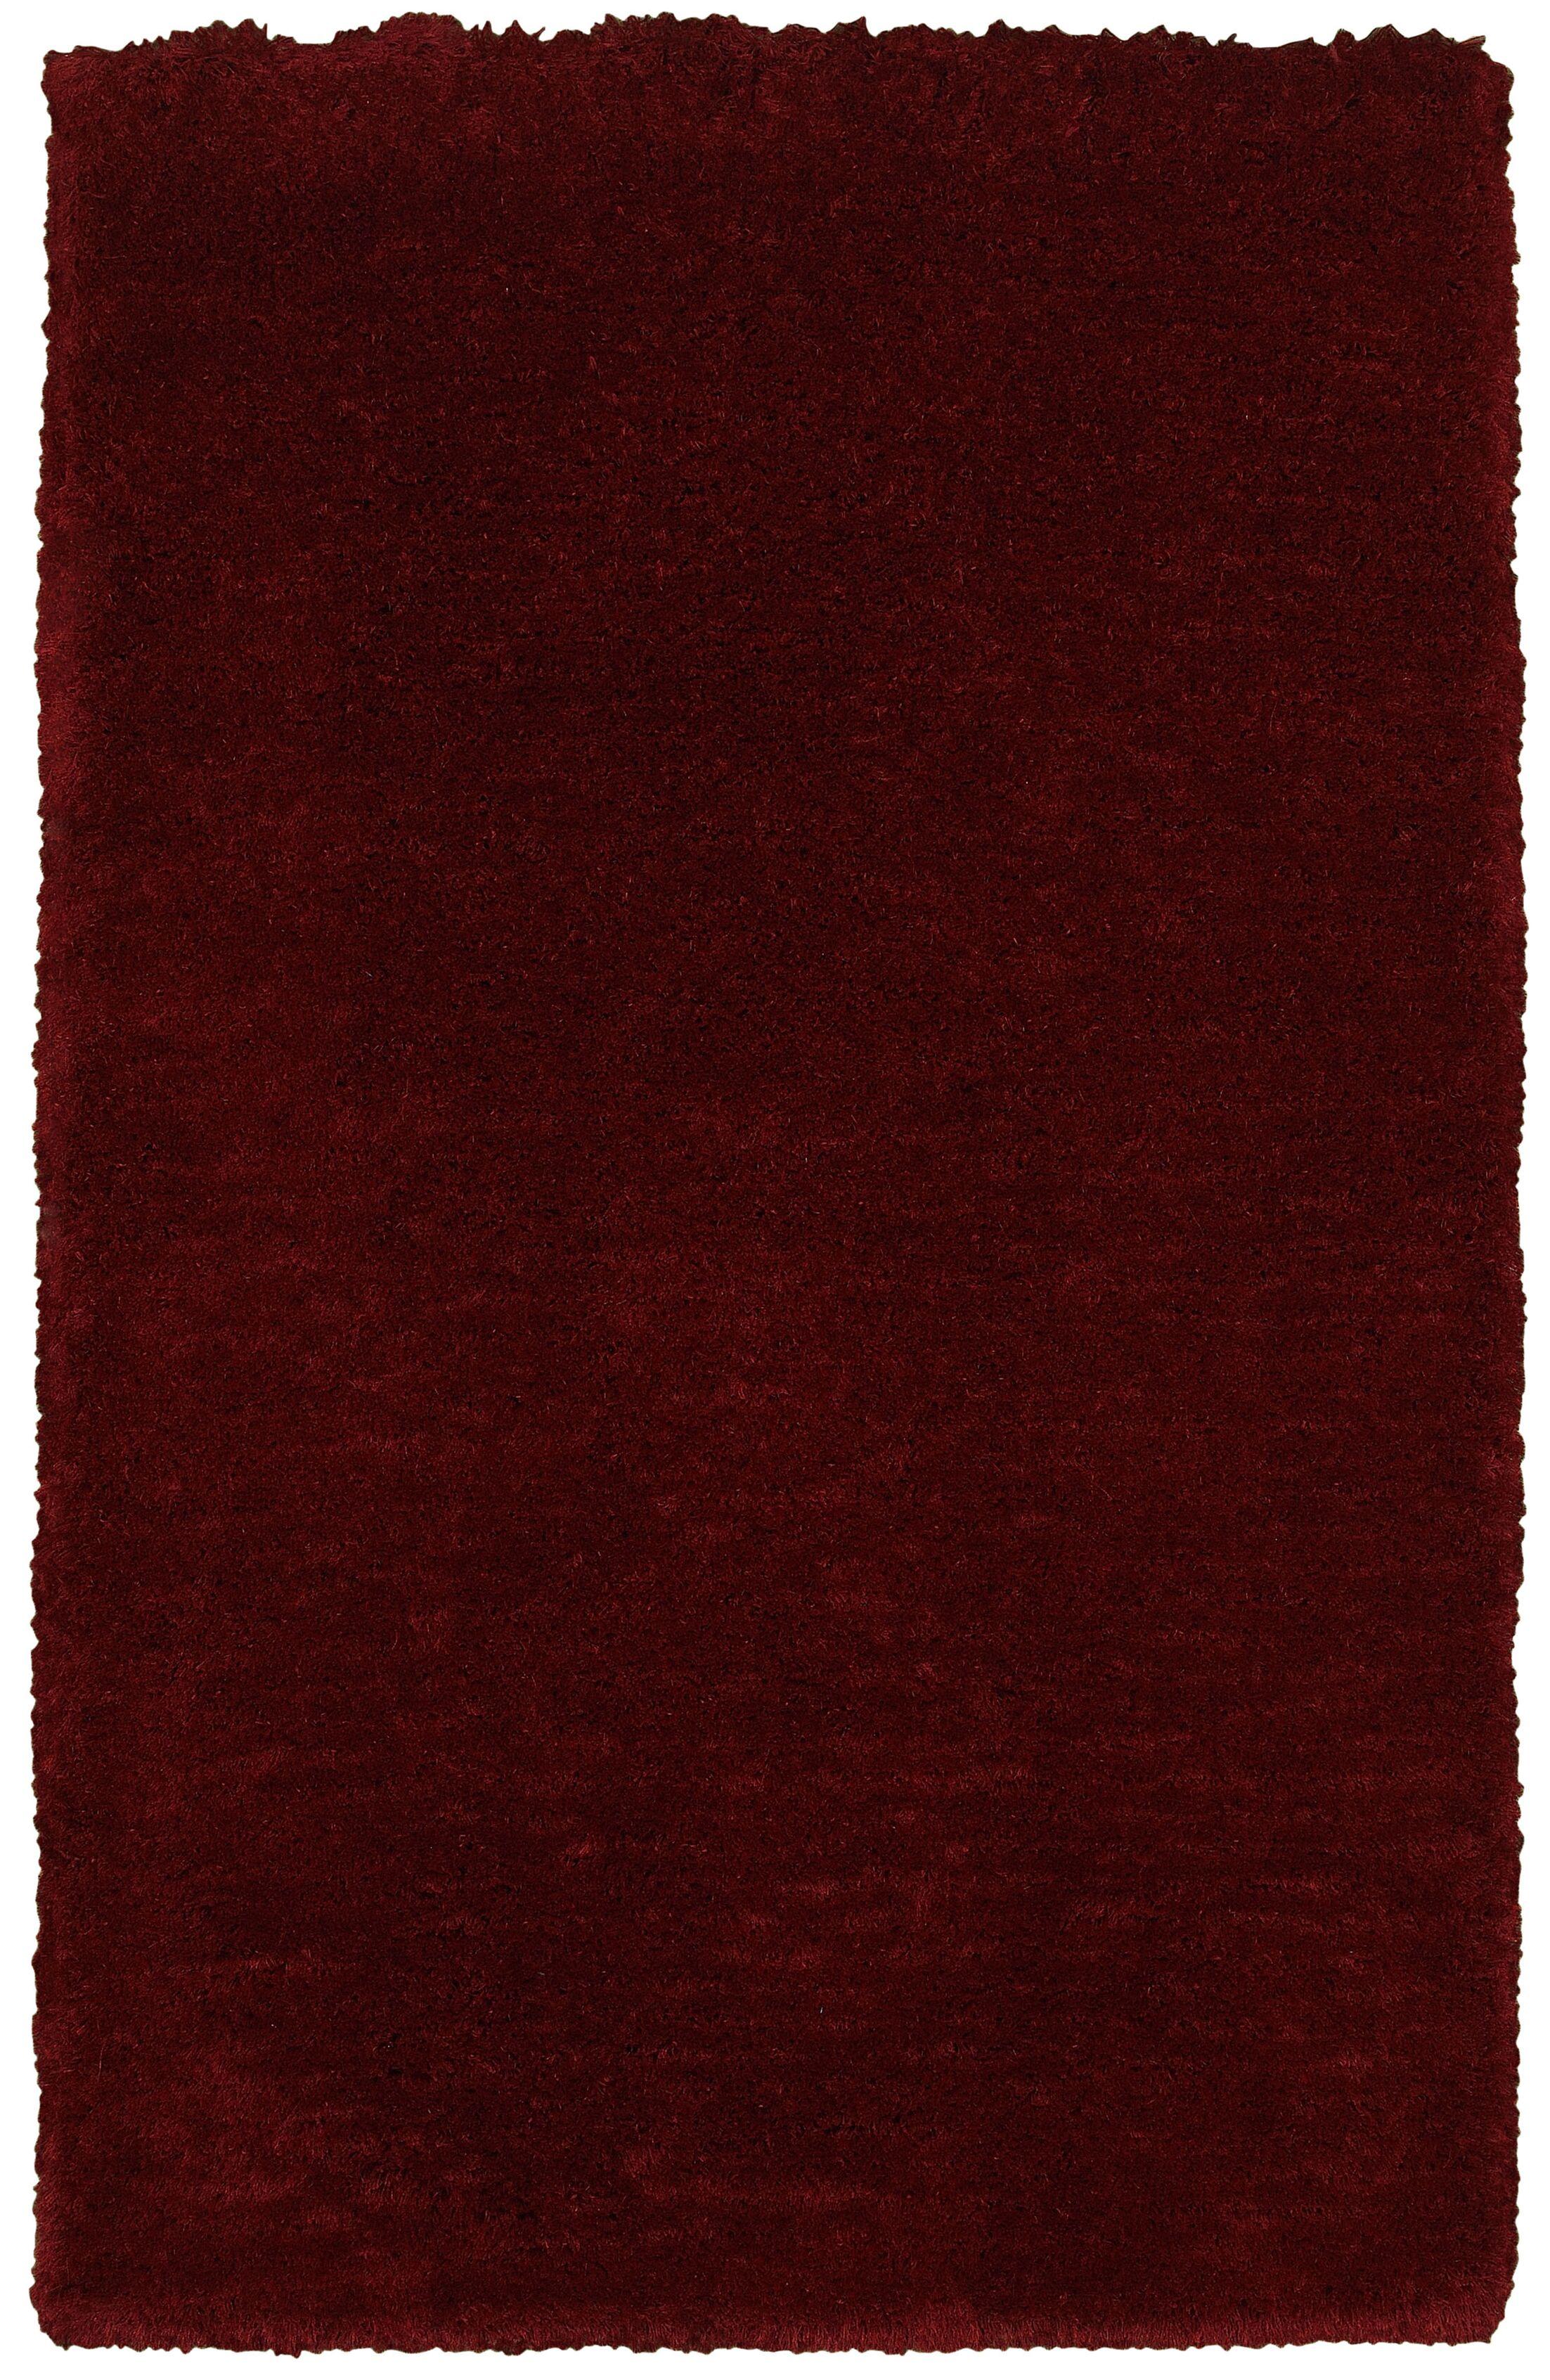 Mathena Hand-Woven Burgundy Area Rug Rug Size: Rectangle 8' x 10'